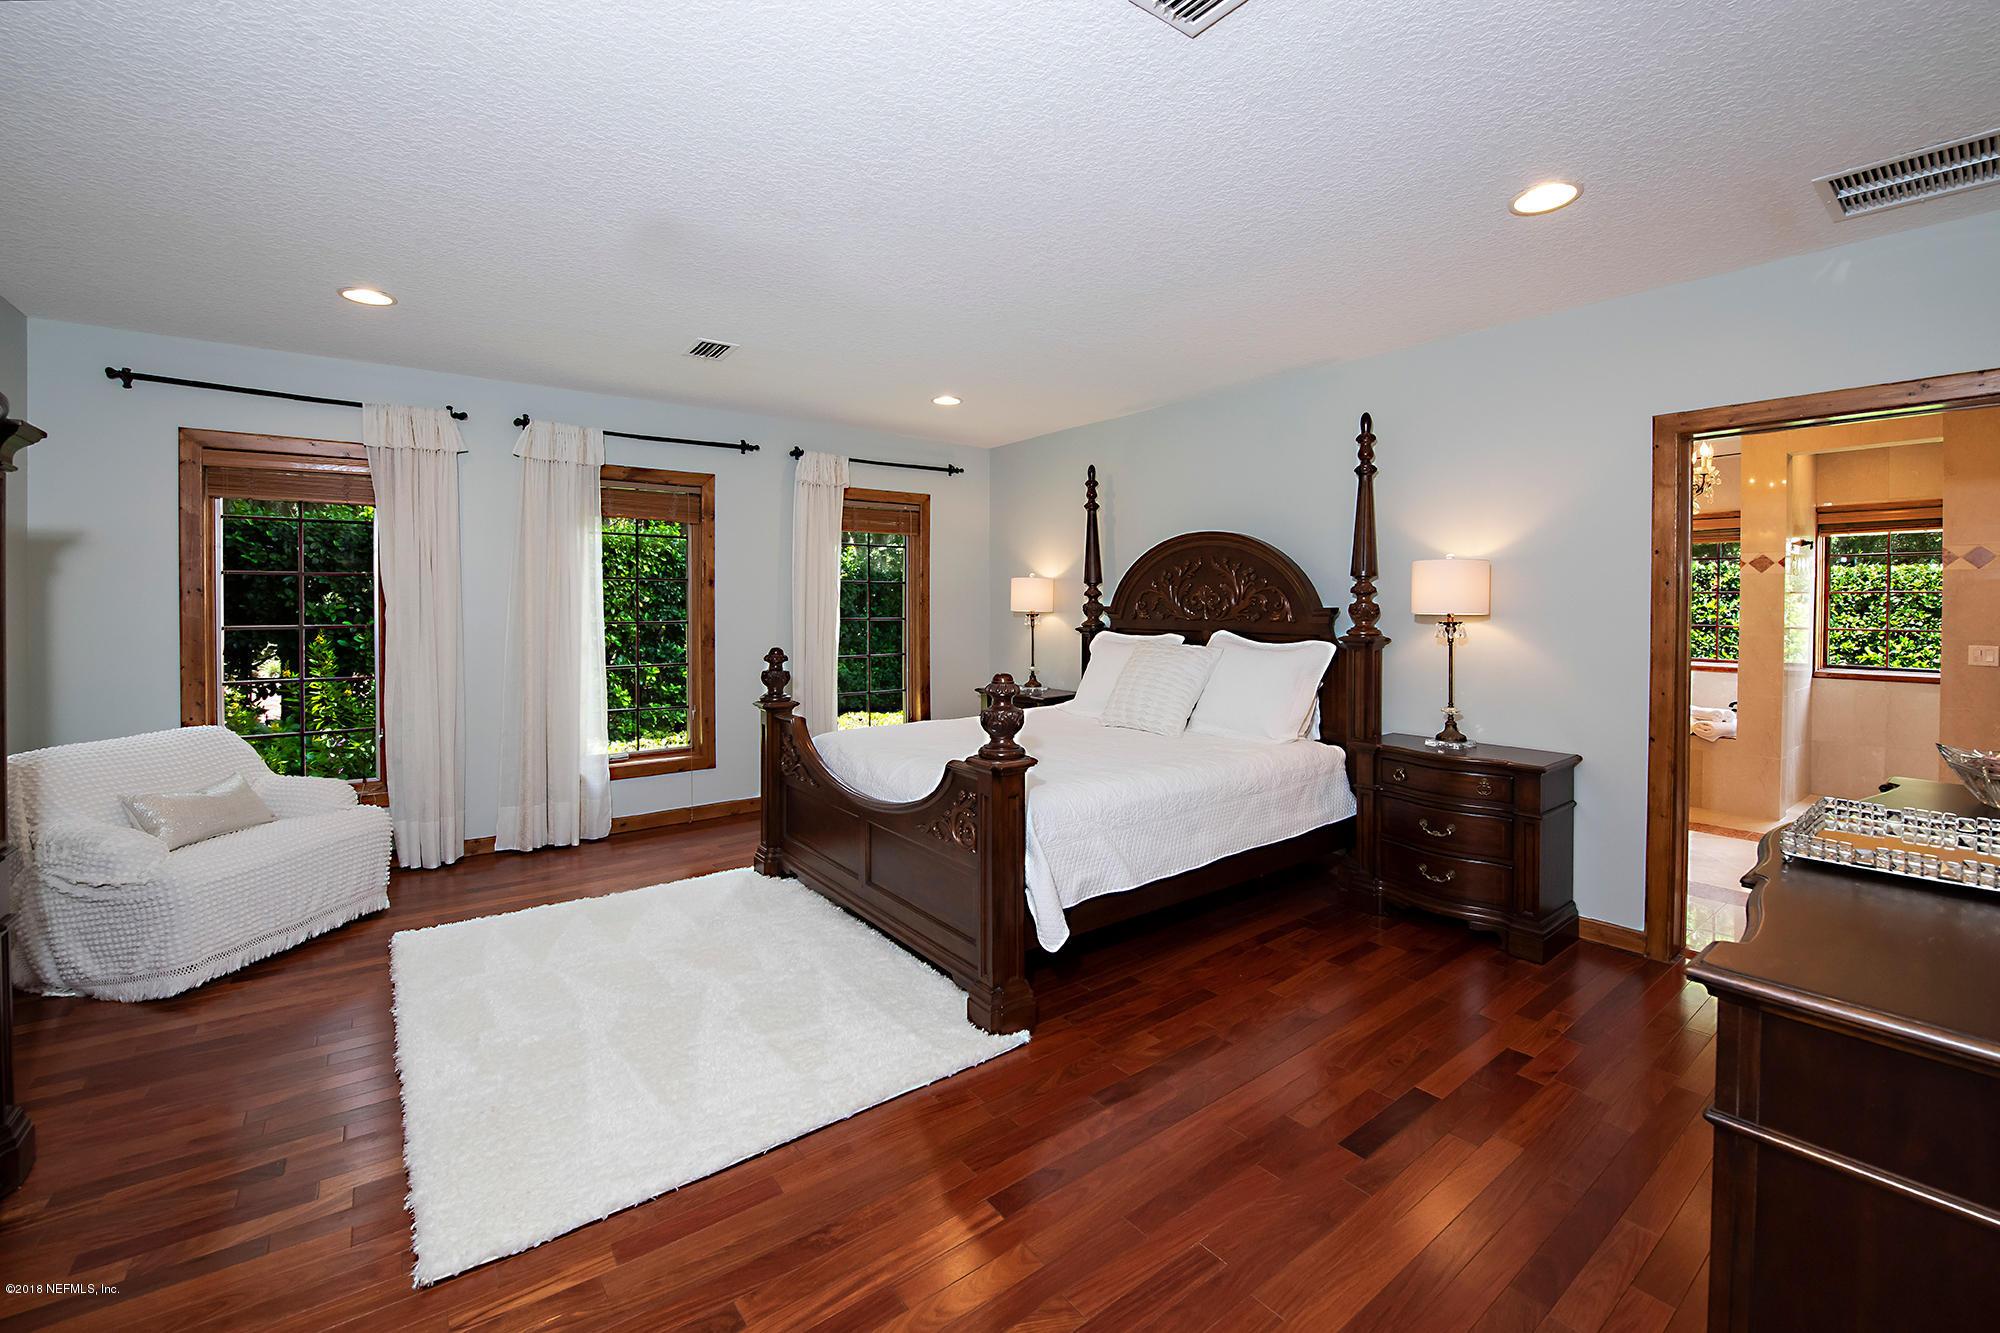 169 RIVER MARSH, PONTE VEDRA BEACH, FLORIDA 32082, 4 Bedrooms Bedrooms, ,3 BathroomsBathrooms,Residential - single family,For sale,RIVER MARSH,946207